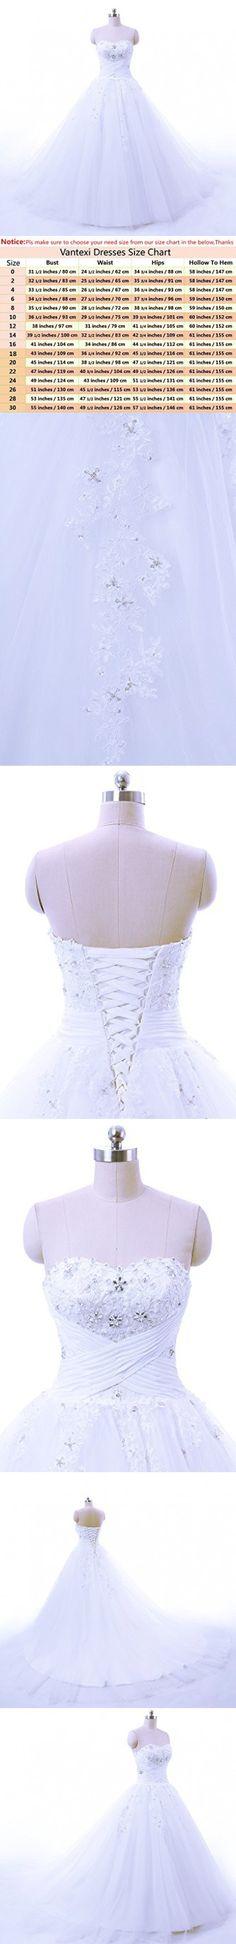 Vantexi Women's Strapless Chapel Train Ball Gown Wedding Dress White Size 2